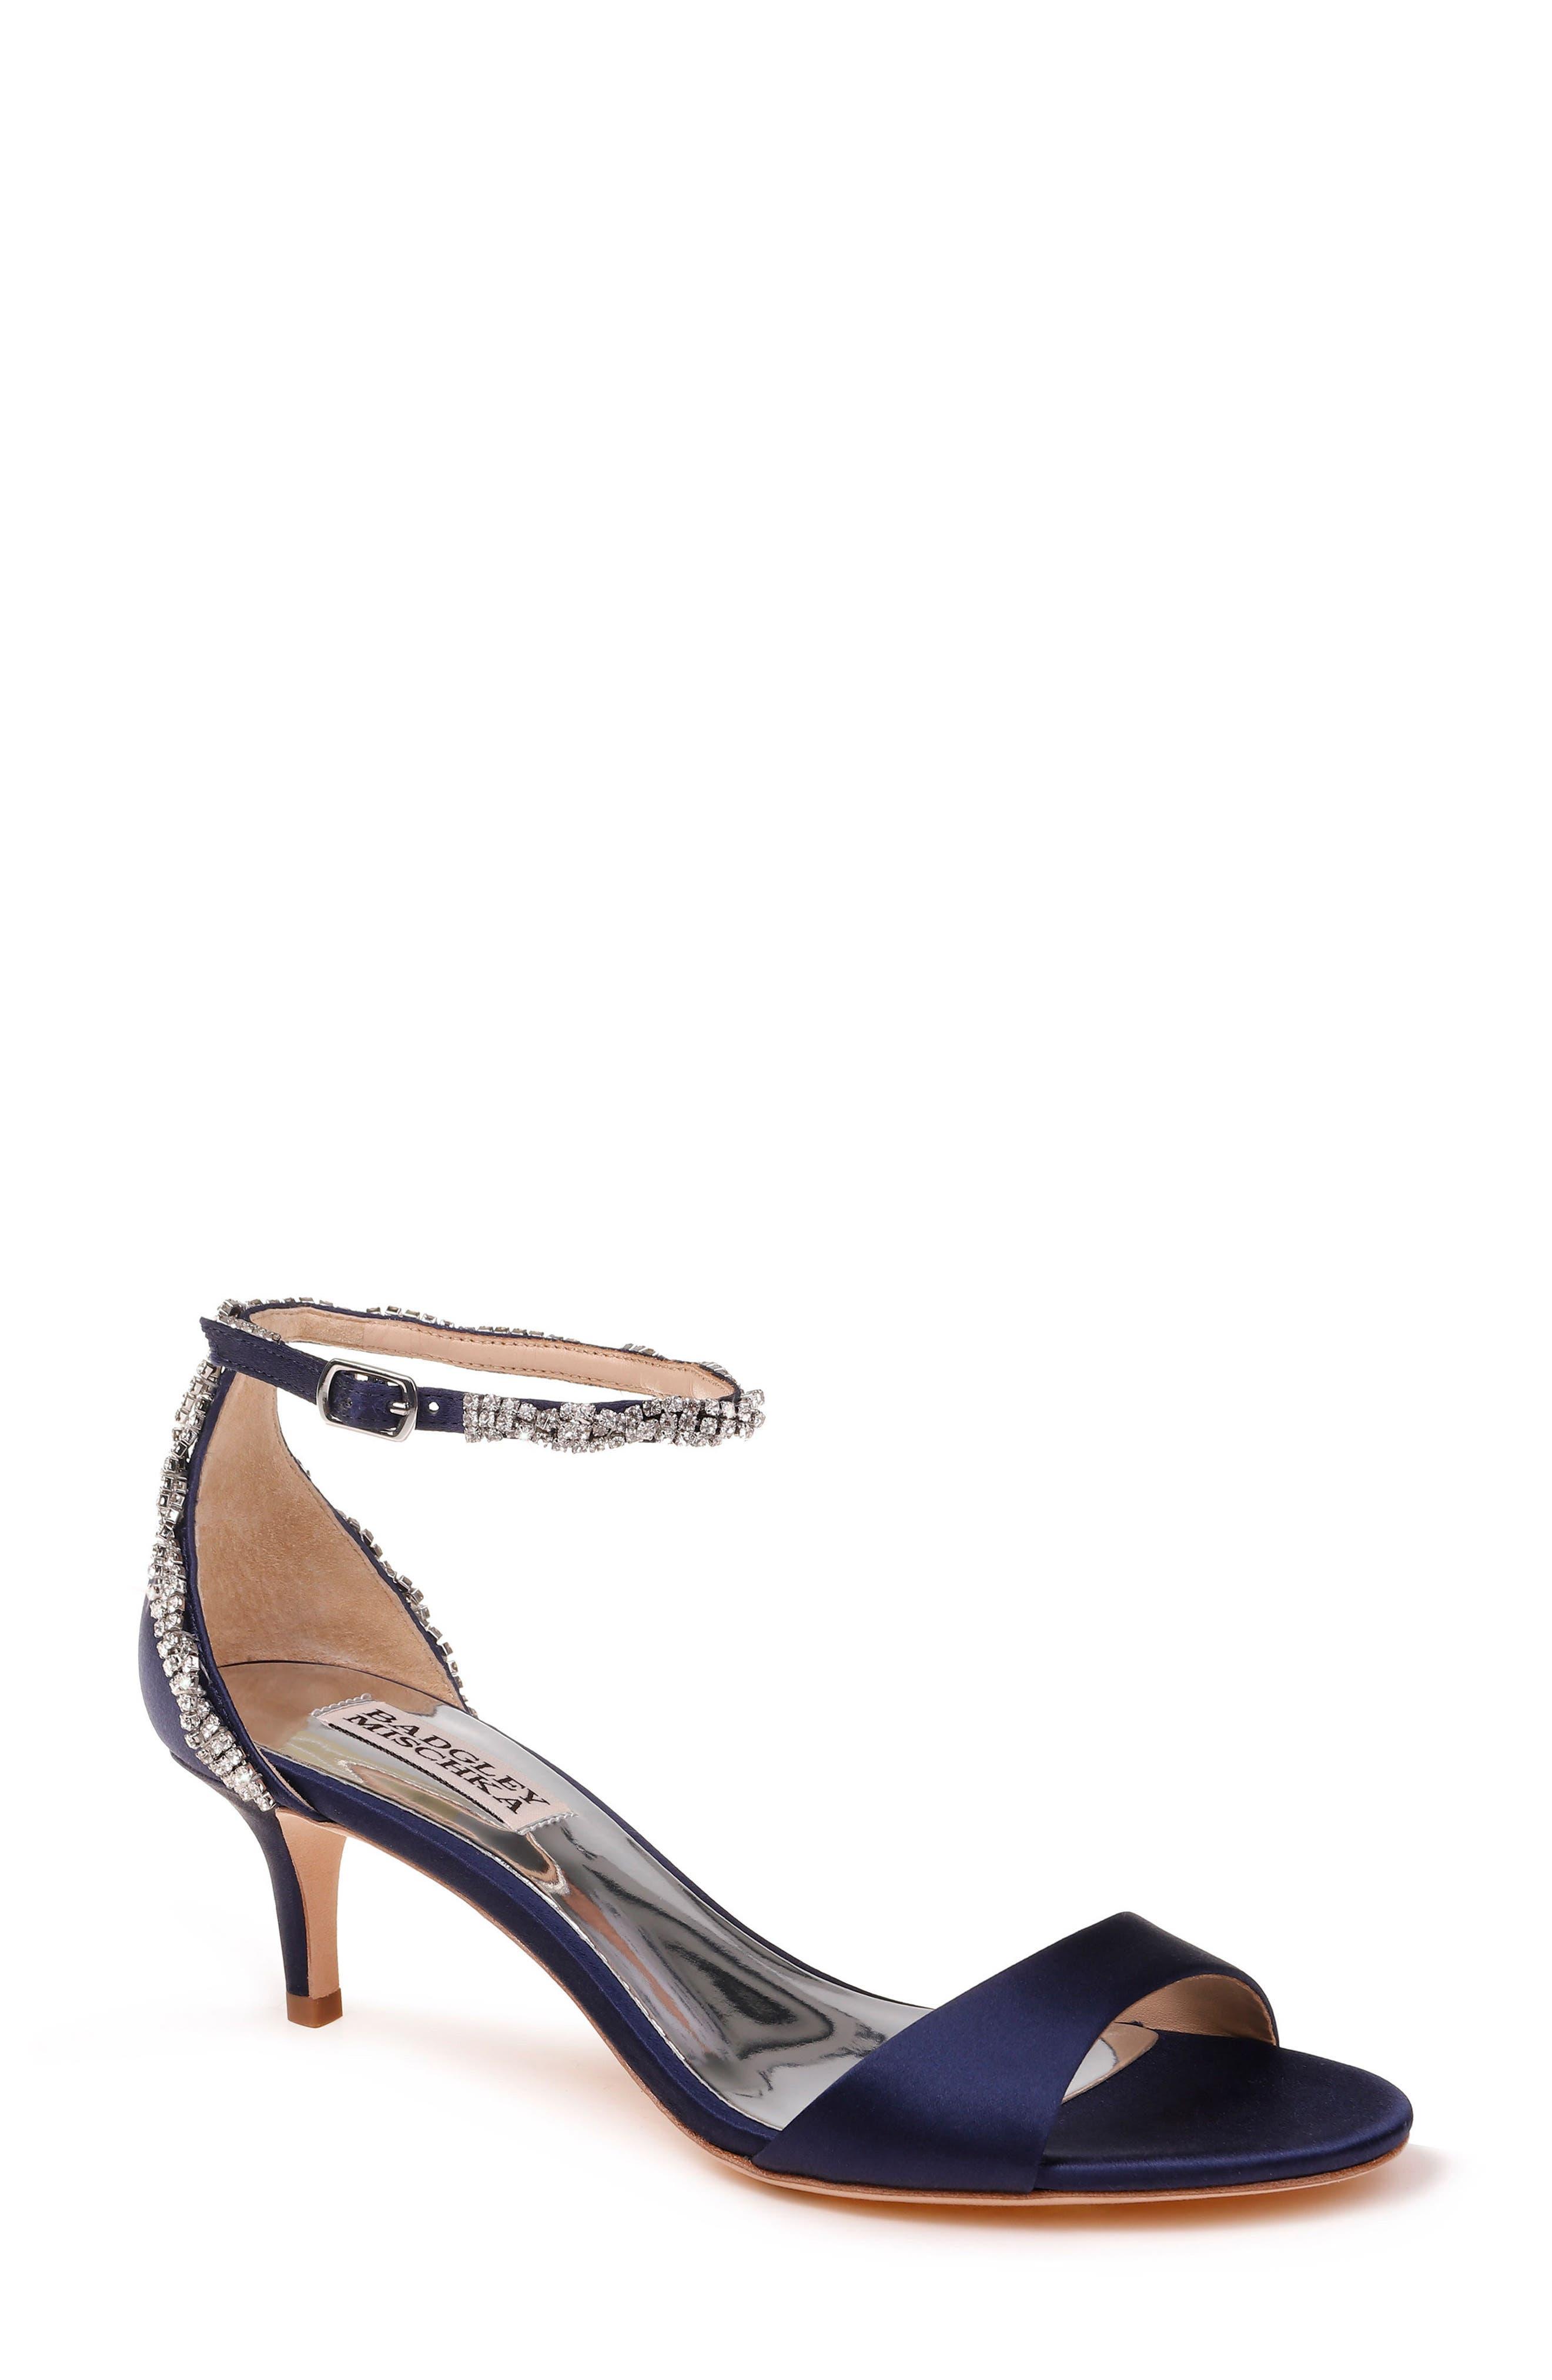 Yareli Crystal Embellished Sandal,                             Main thumbnail 1, color,                             Midnight Satin